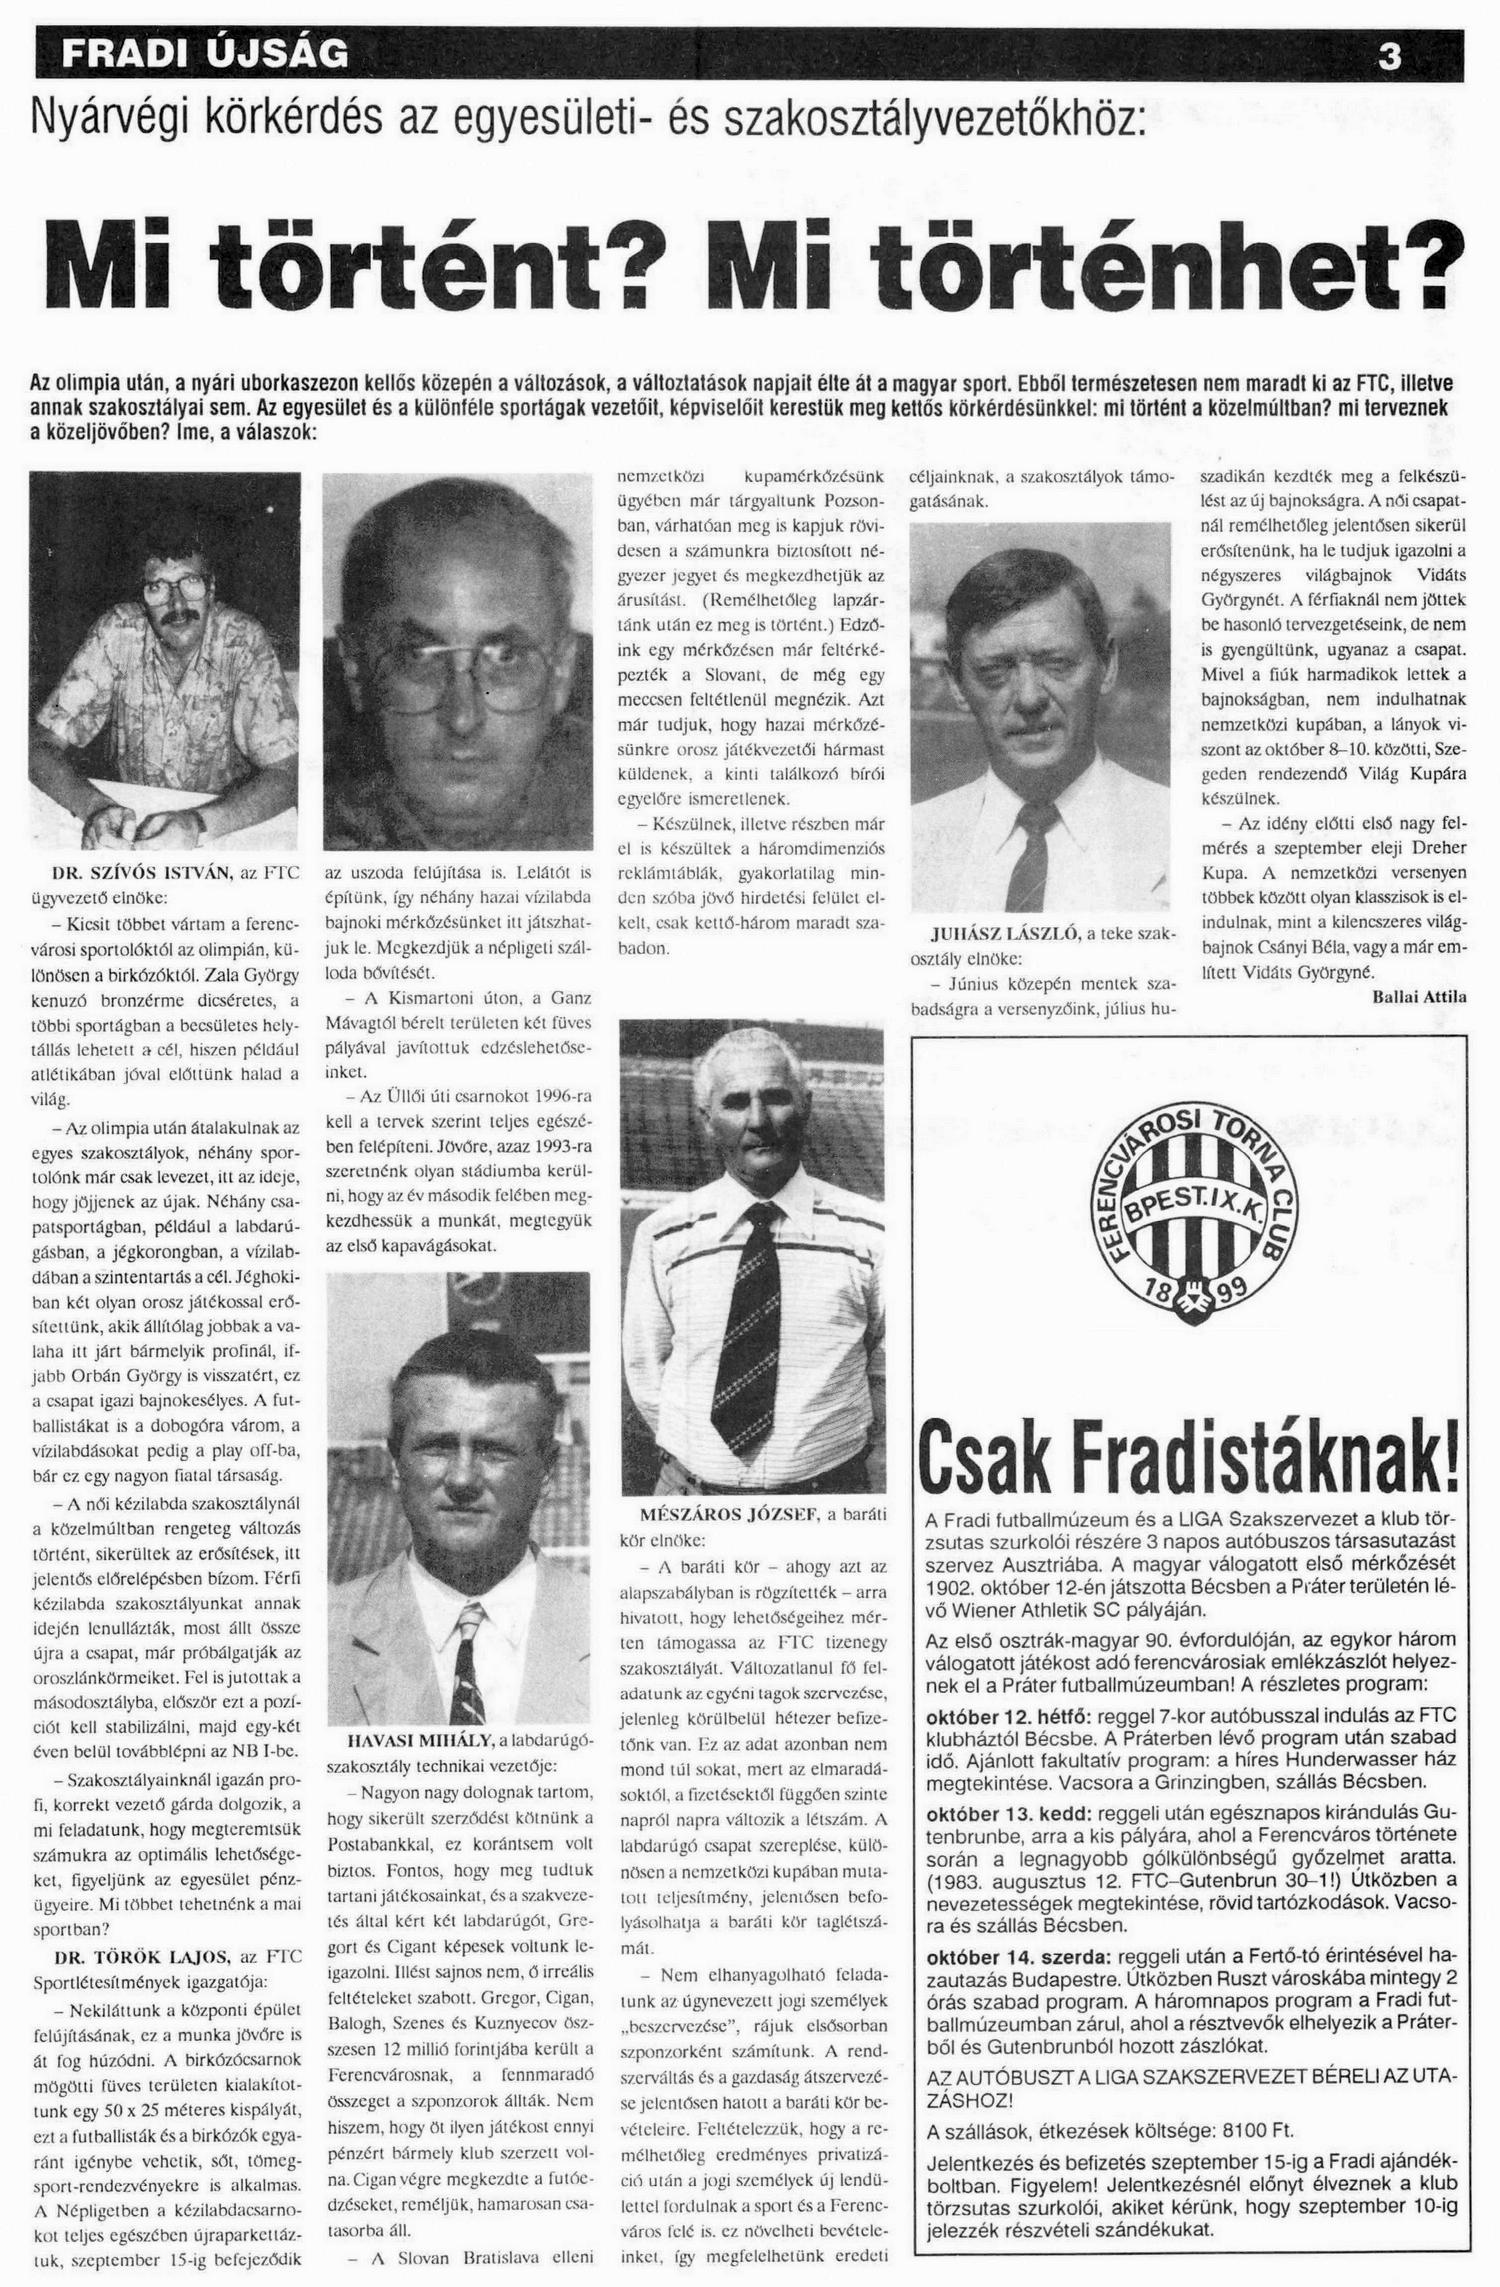 TFU_19920900_FU-Zs_011 -0003